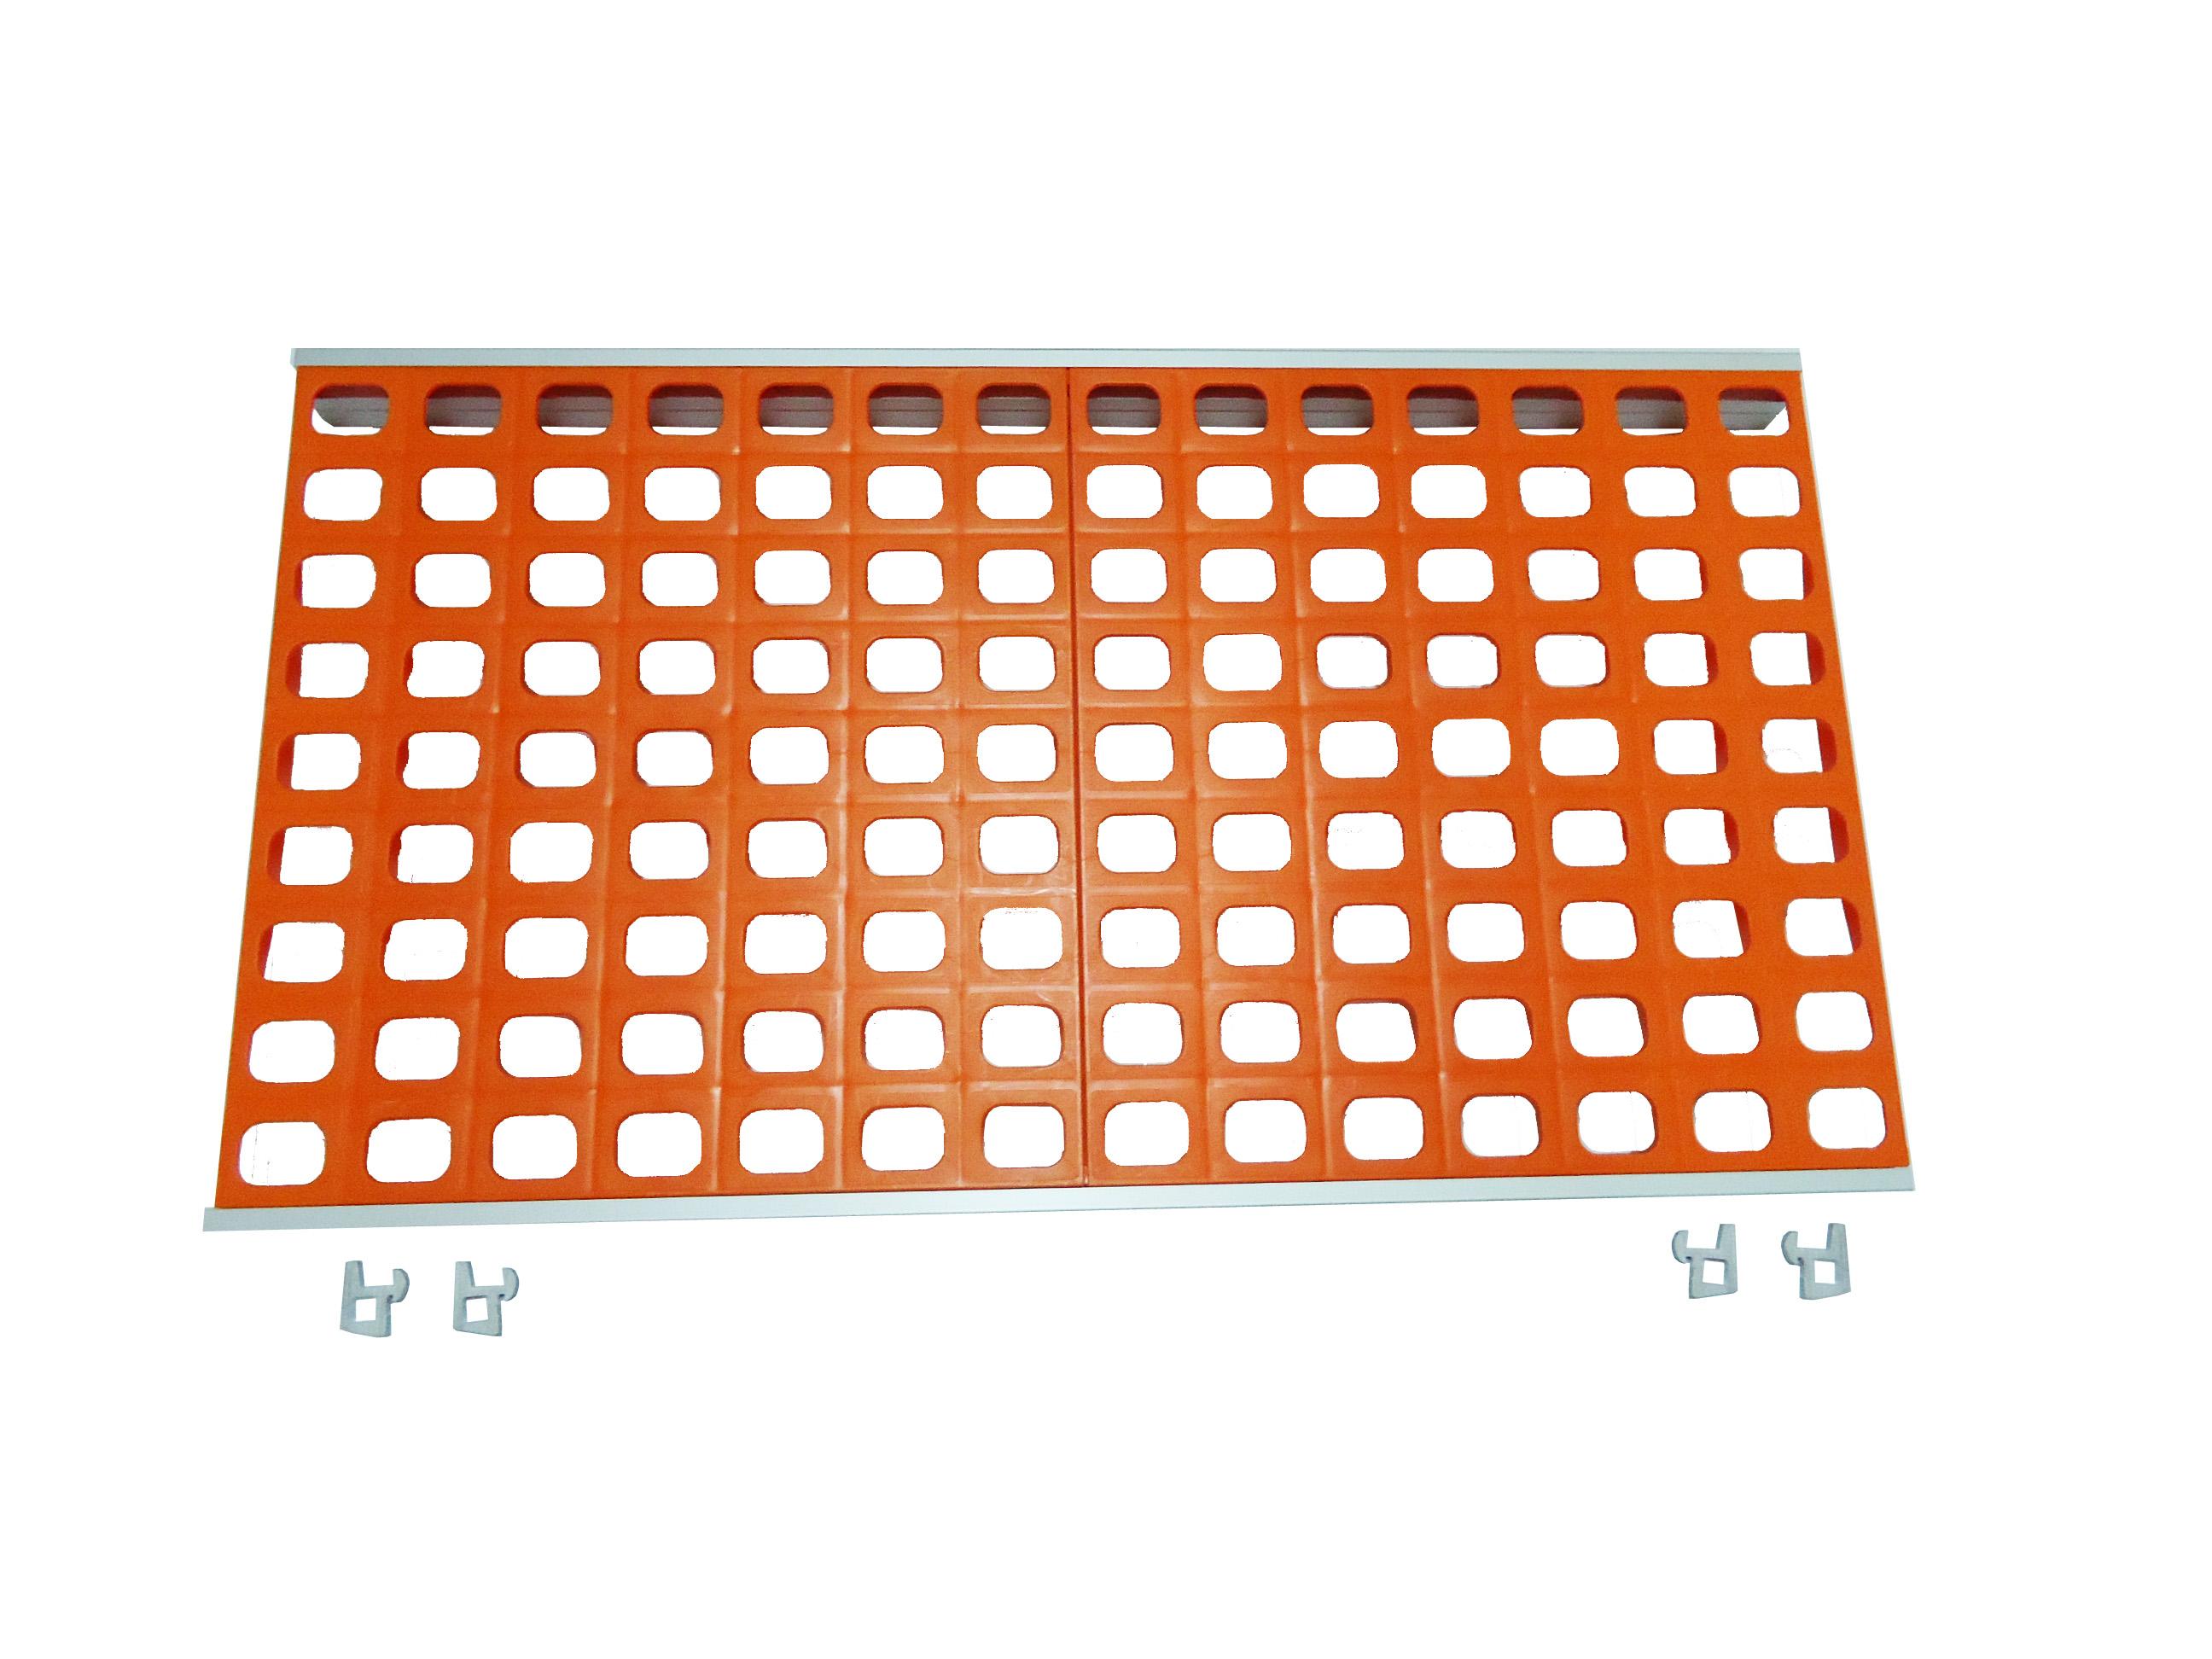 Coolblok KOPA47106C Ραφιέρα - Ράφι Ψυκτικών Θαλάμων Μονό Πολυαιθυλενίου - 1060x4 ψυκτικοί θάλαμοι    ράφια ψυκτικών θαλάμων  ψυκτικοί θάλαμοι    ράφια ψυκτικών θ